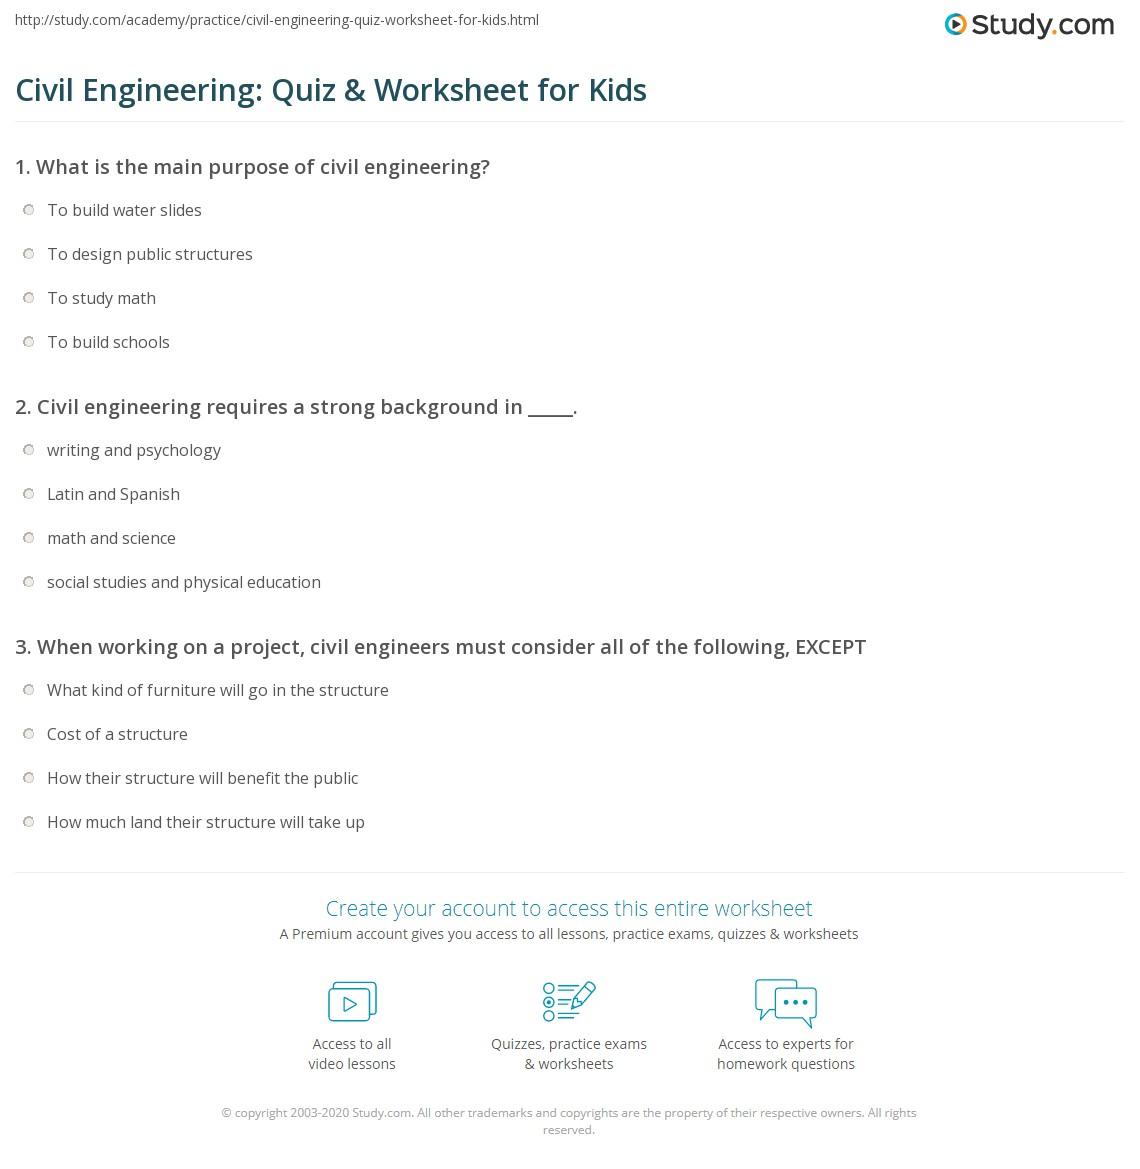 Civil Engineering: Quiz & Worksheet for Kids | Study com